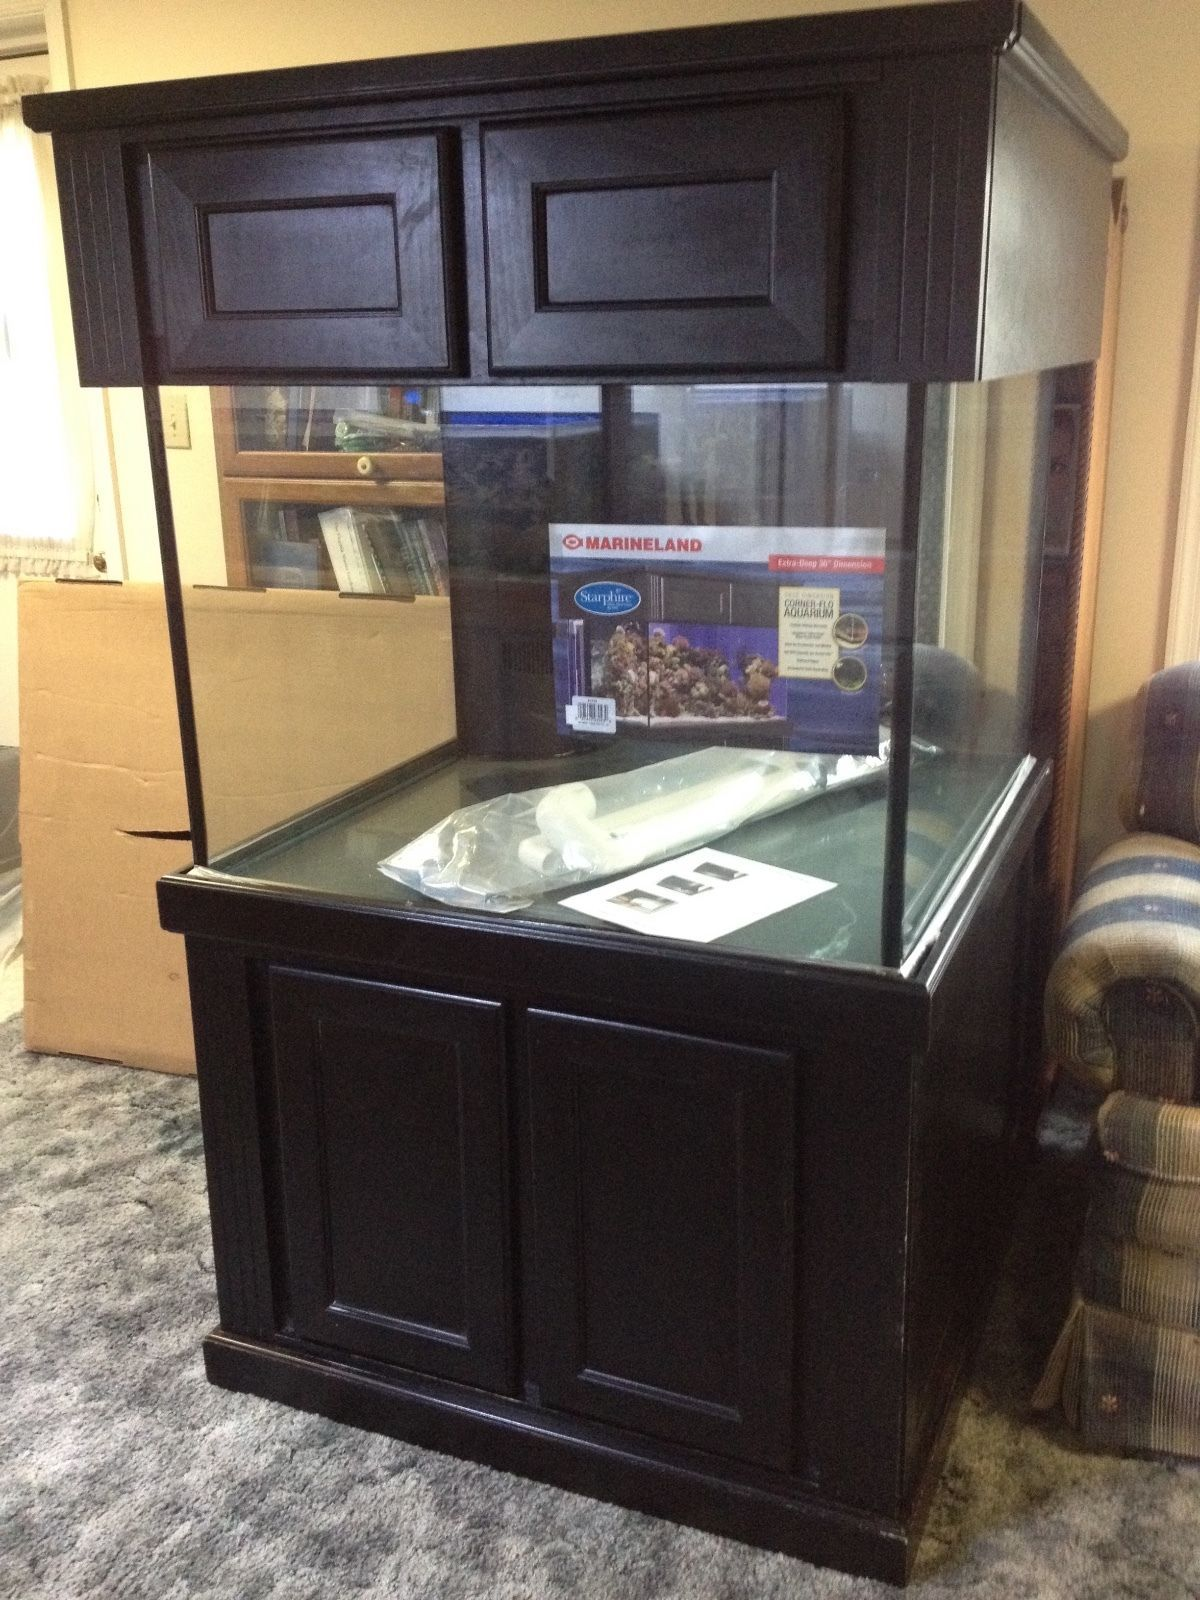 MarineLand 150 Gal Aquarium with overflow and Starphire glass Fish